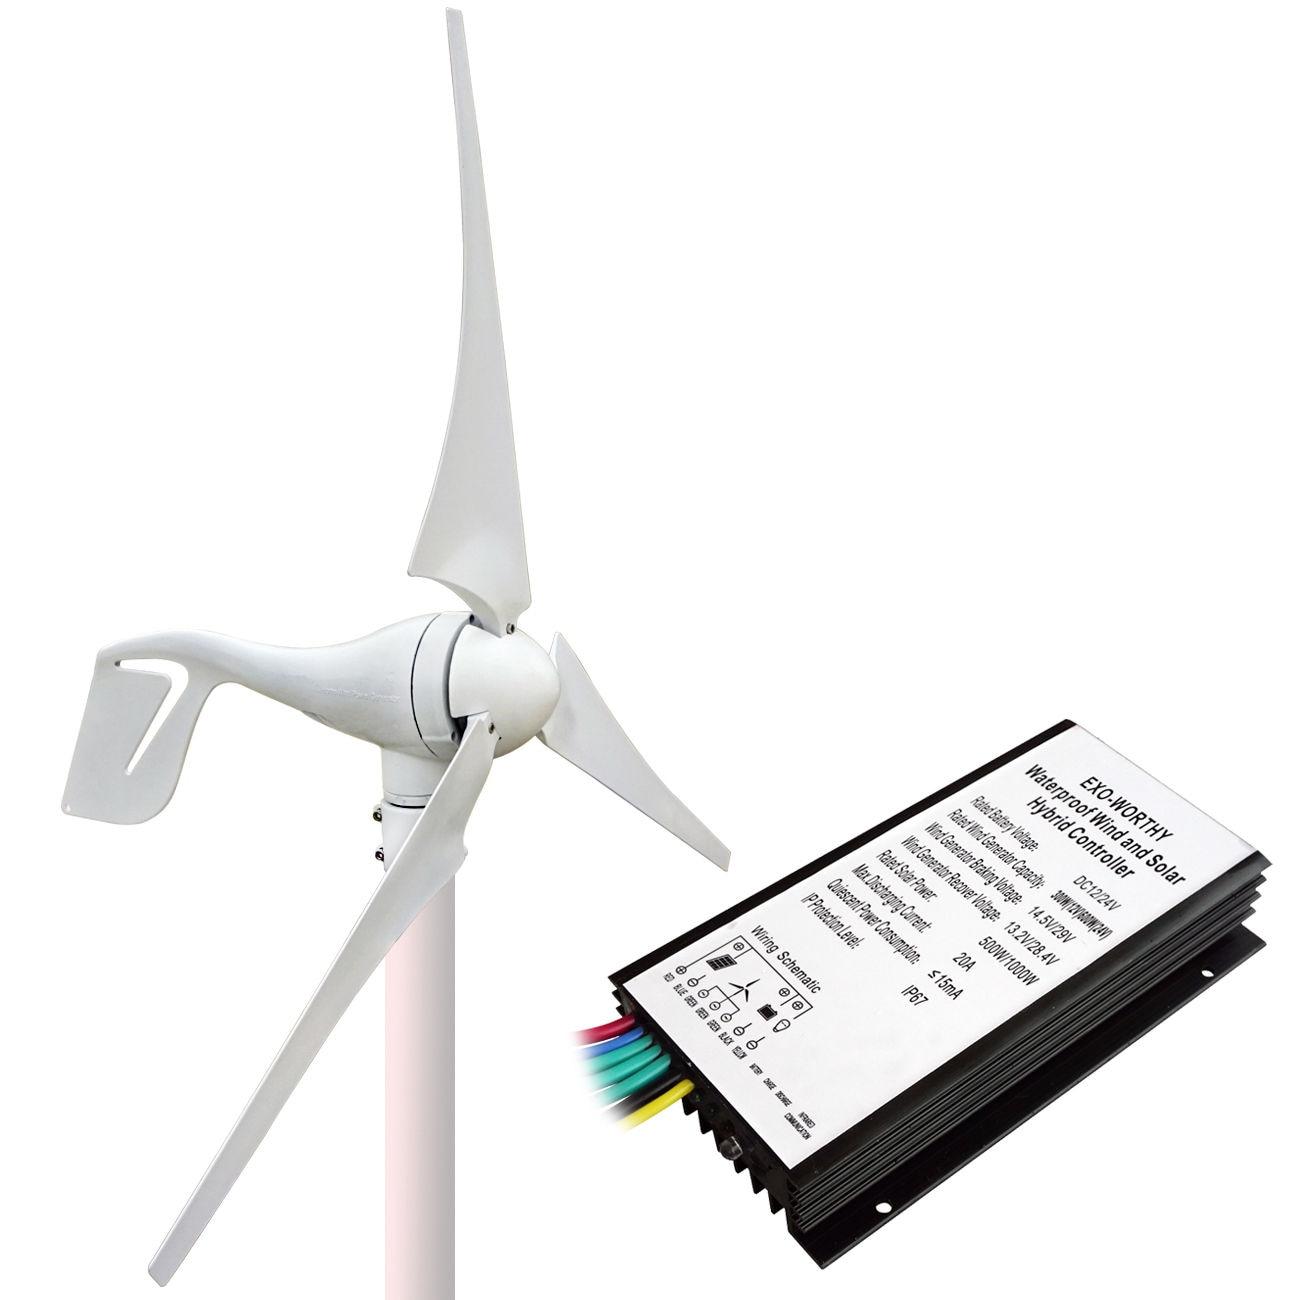 24 Volt Wind Turbine Wiring Diagram Electrical Diagrams Solar Power Aliexpress Com Buy 1400w Kit 400w Generator10100w Battery Charger